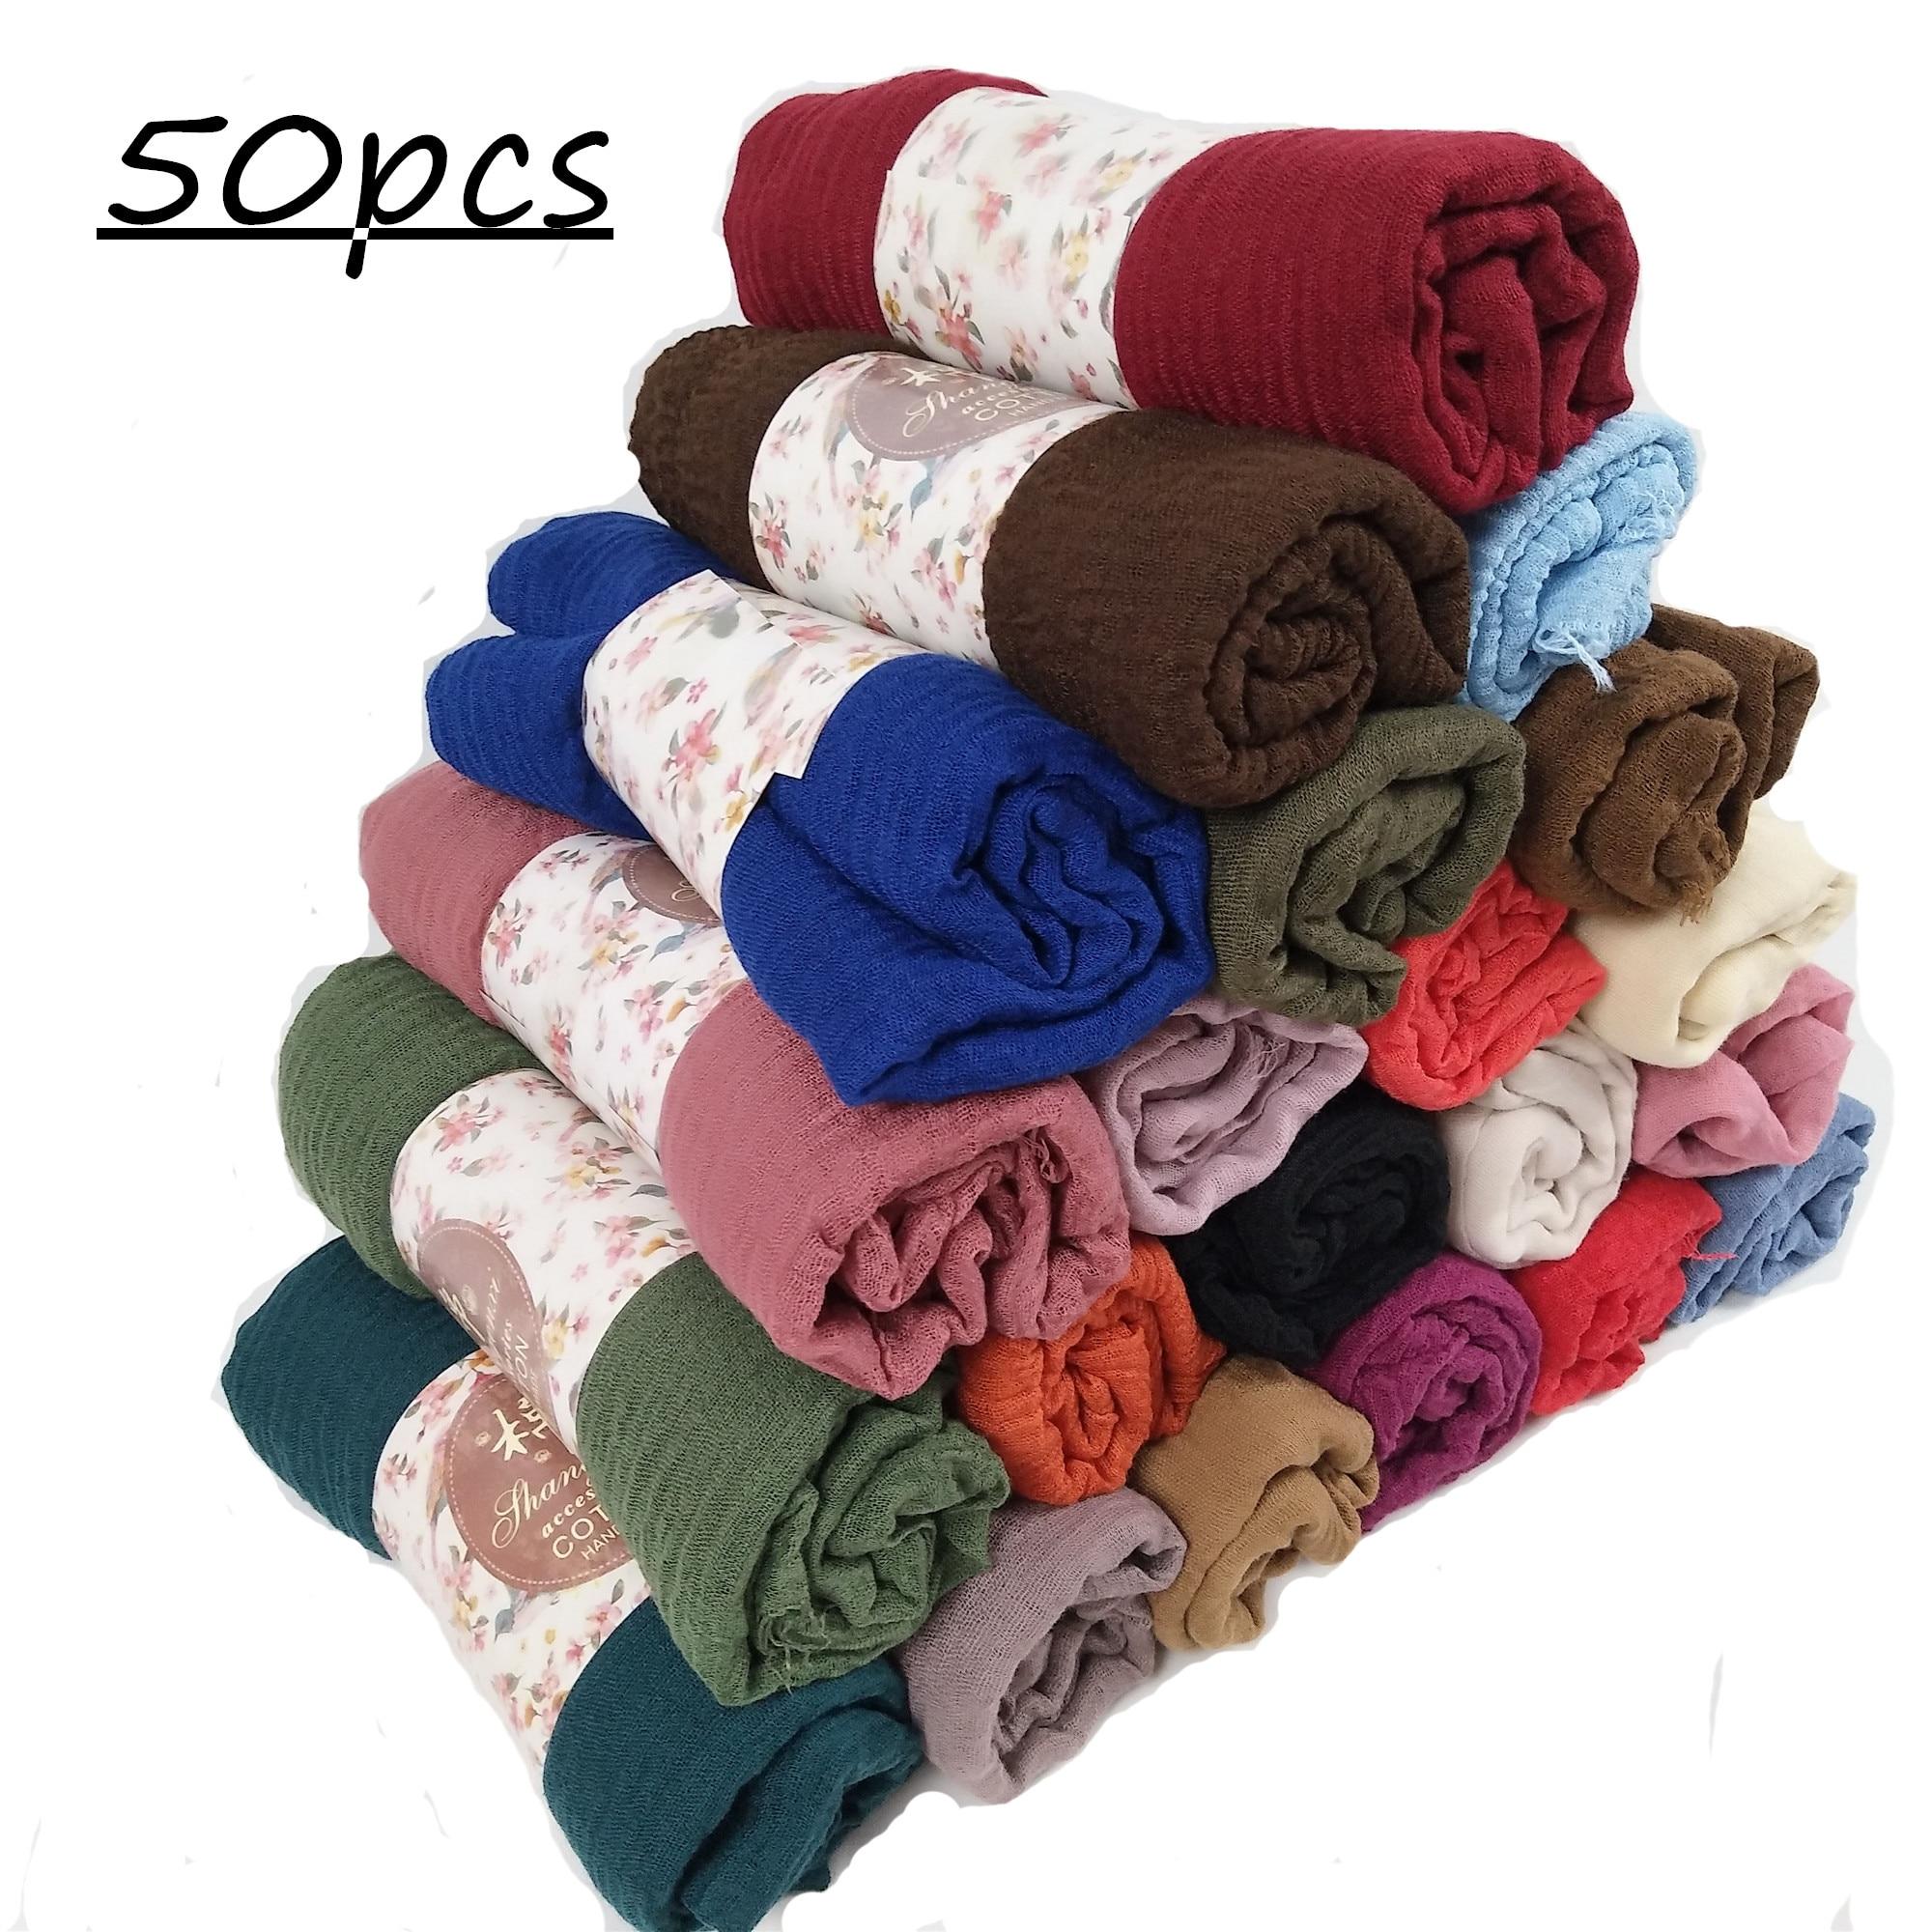 X1 50pcs Crinkle Plain Wrinkle Wrap Bubble Cotton Viscose Long Shawl Scarf Women Crinkled Hijab Shawl